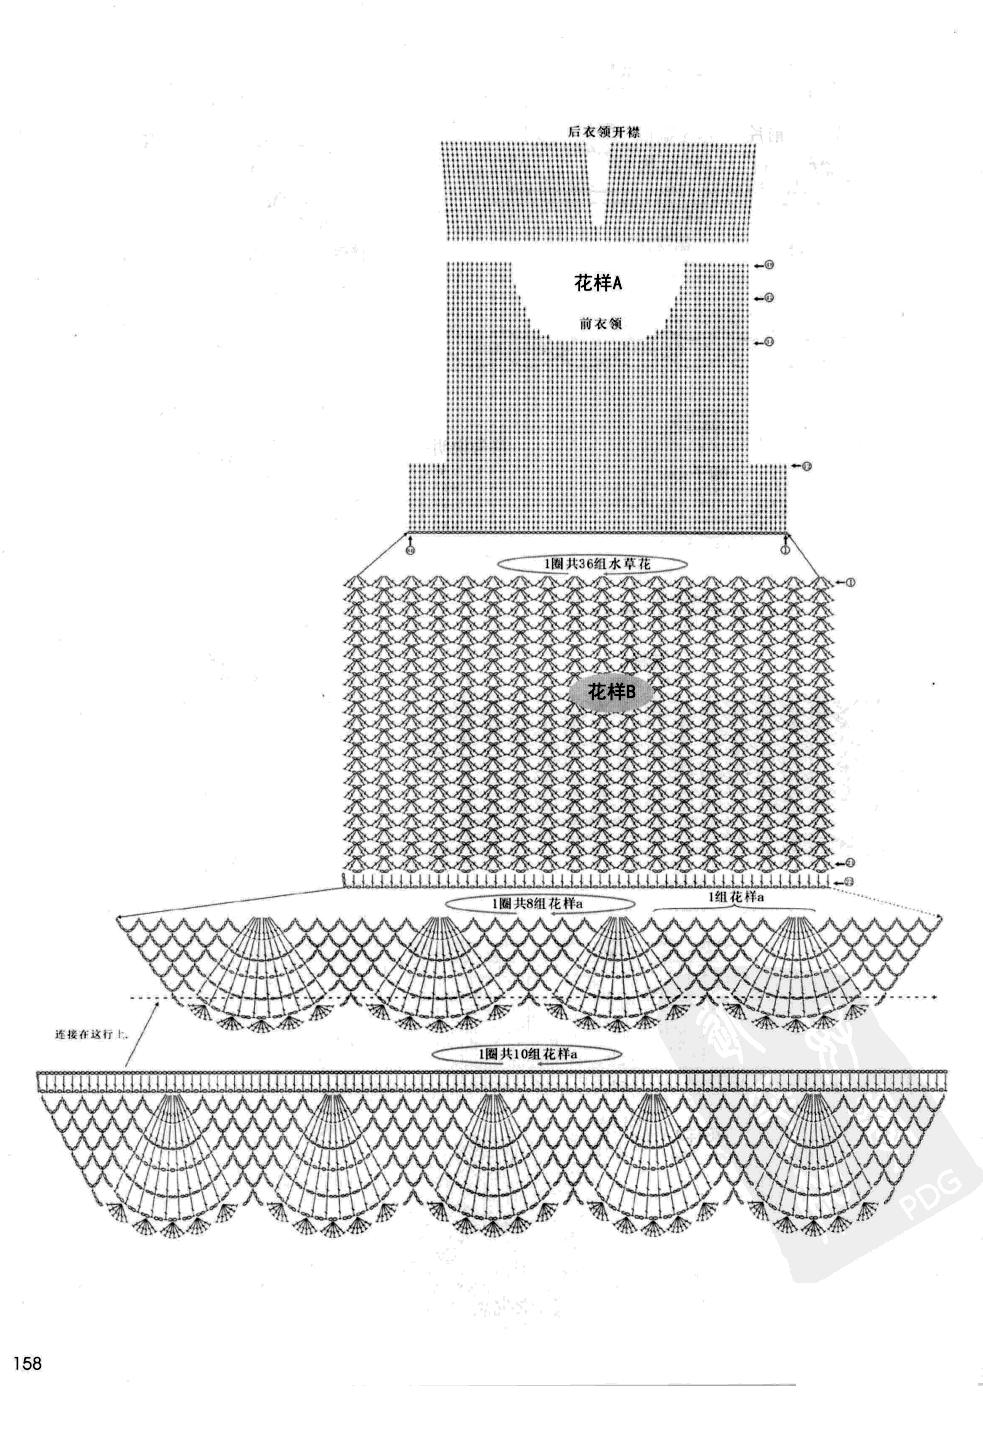 p (158).jpg